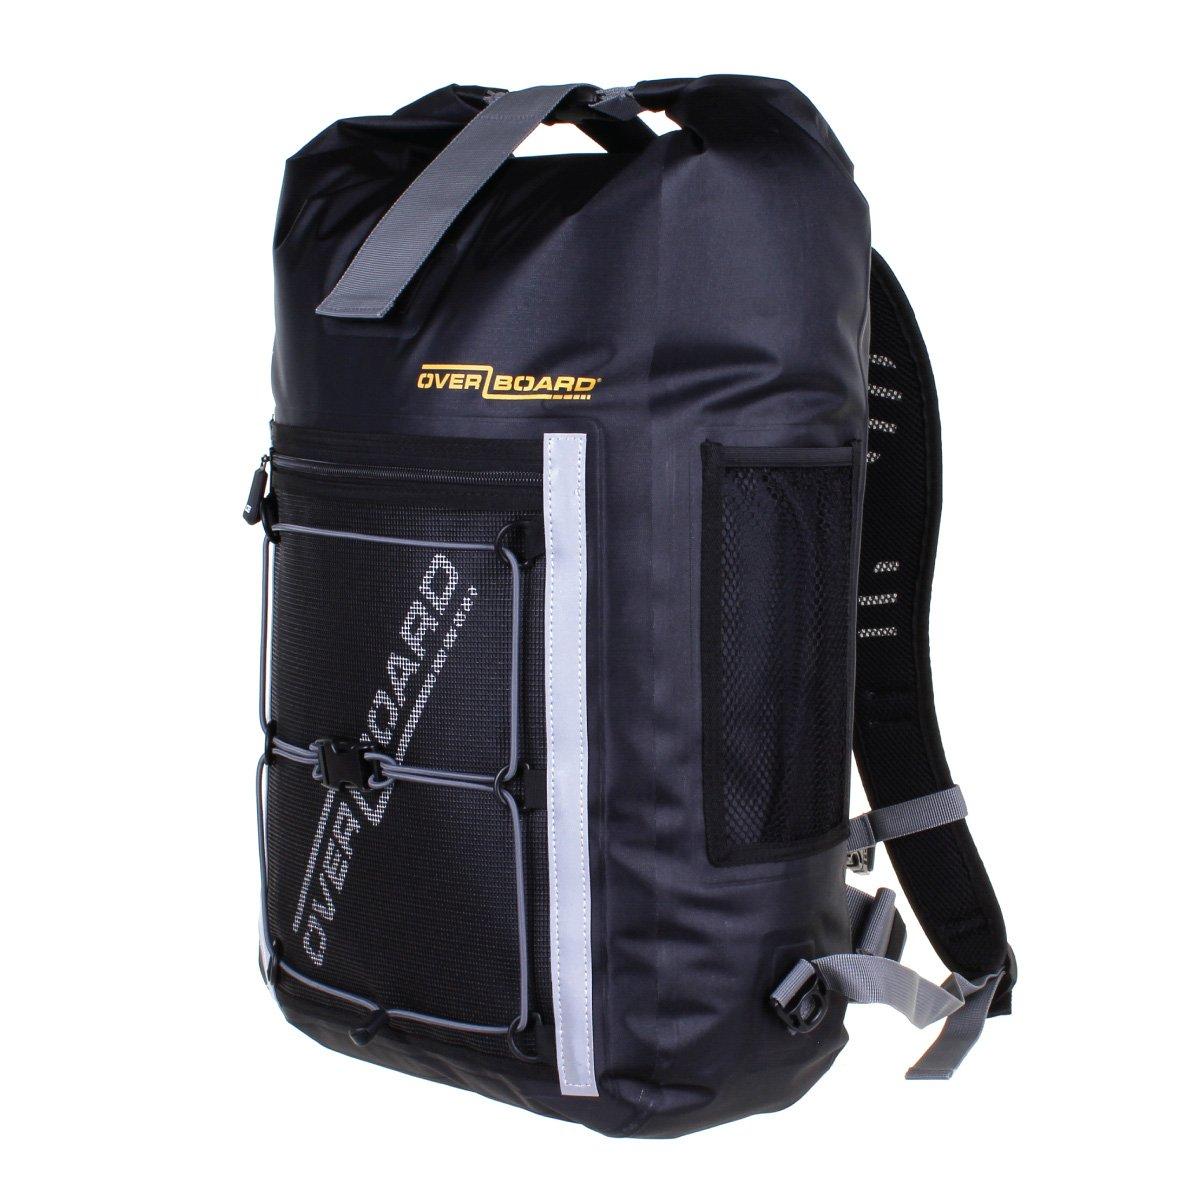 Over Board 12 Litre Pro-Light Backpack - SS19